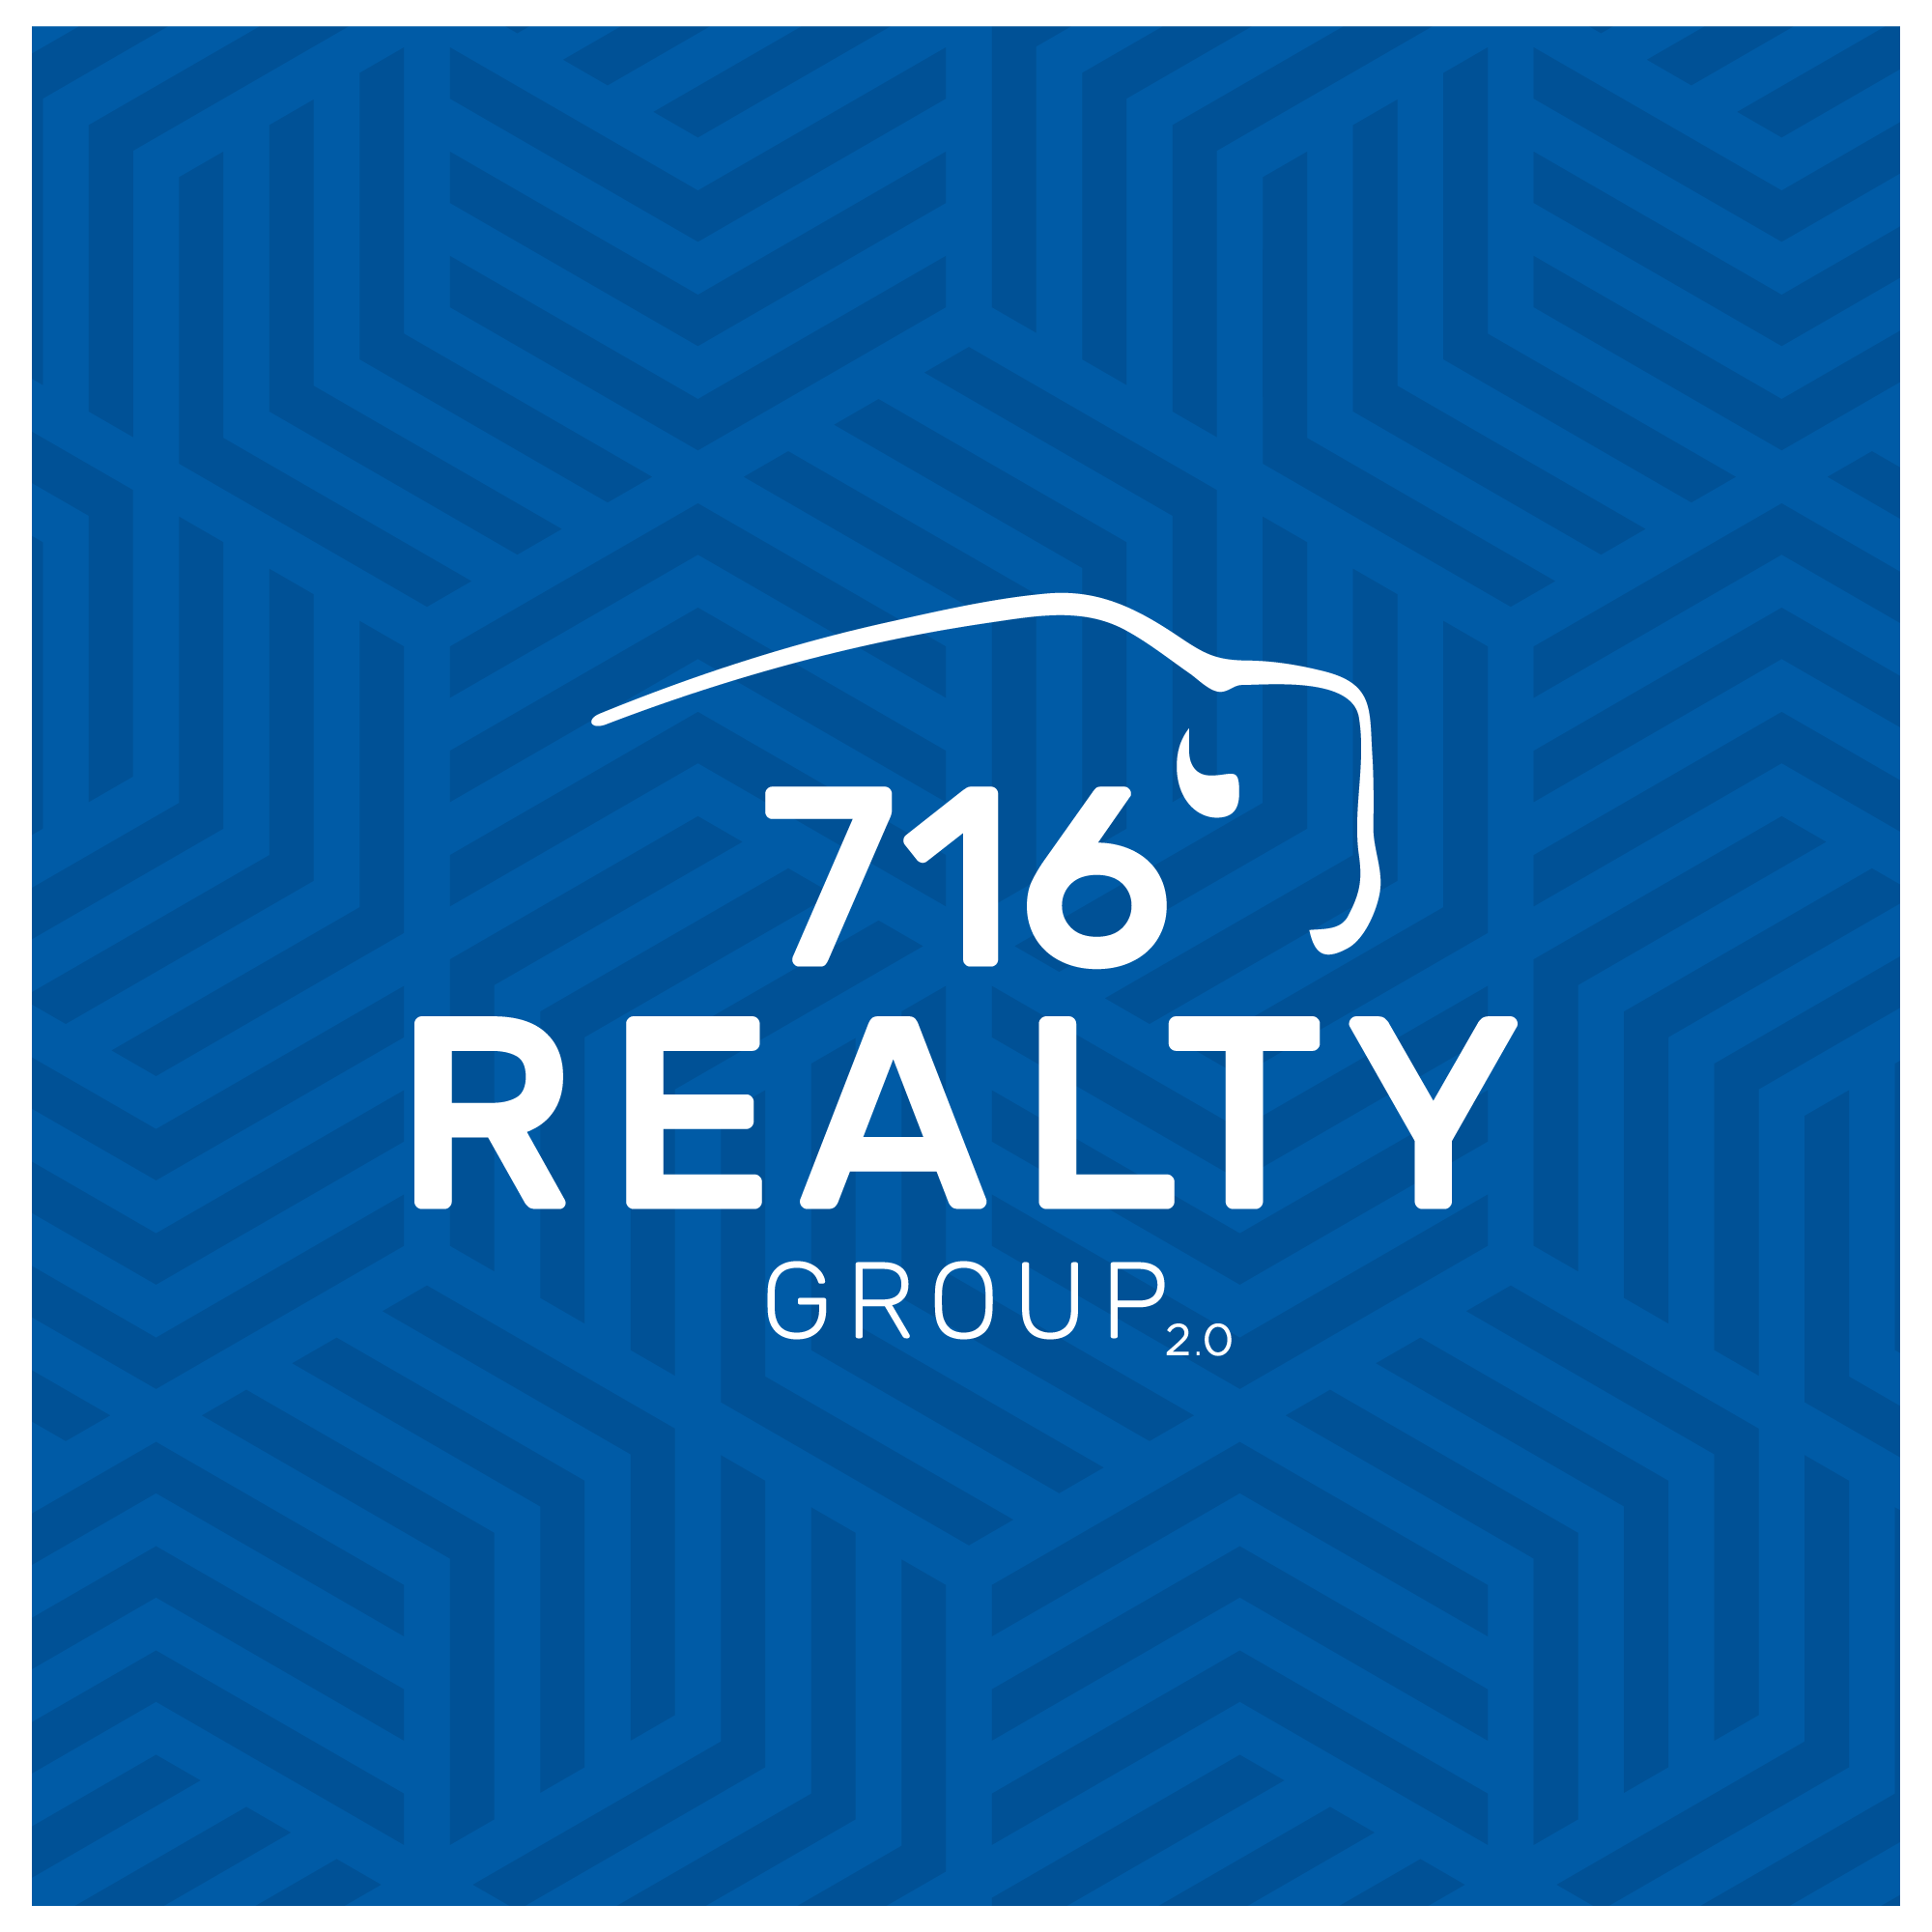 716 Realty Group 2.0 logo